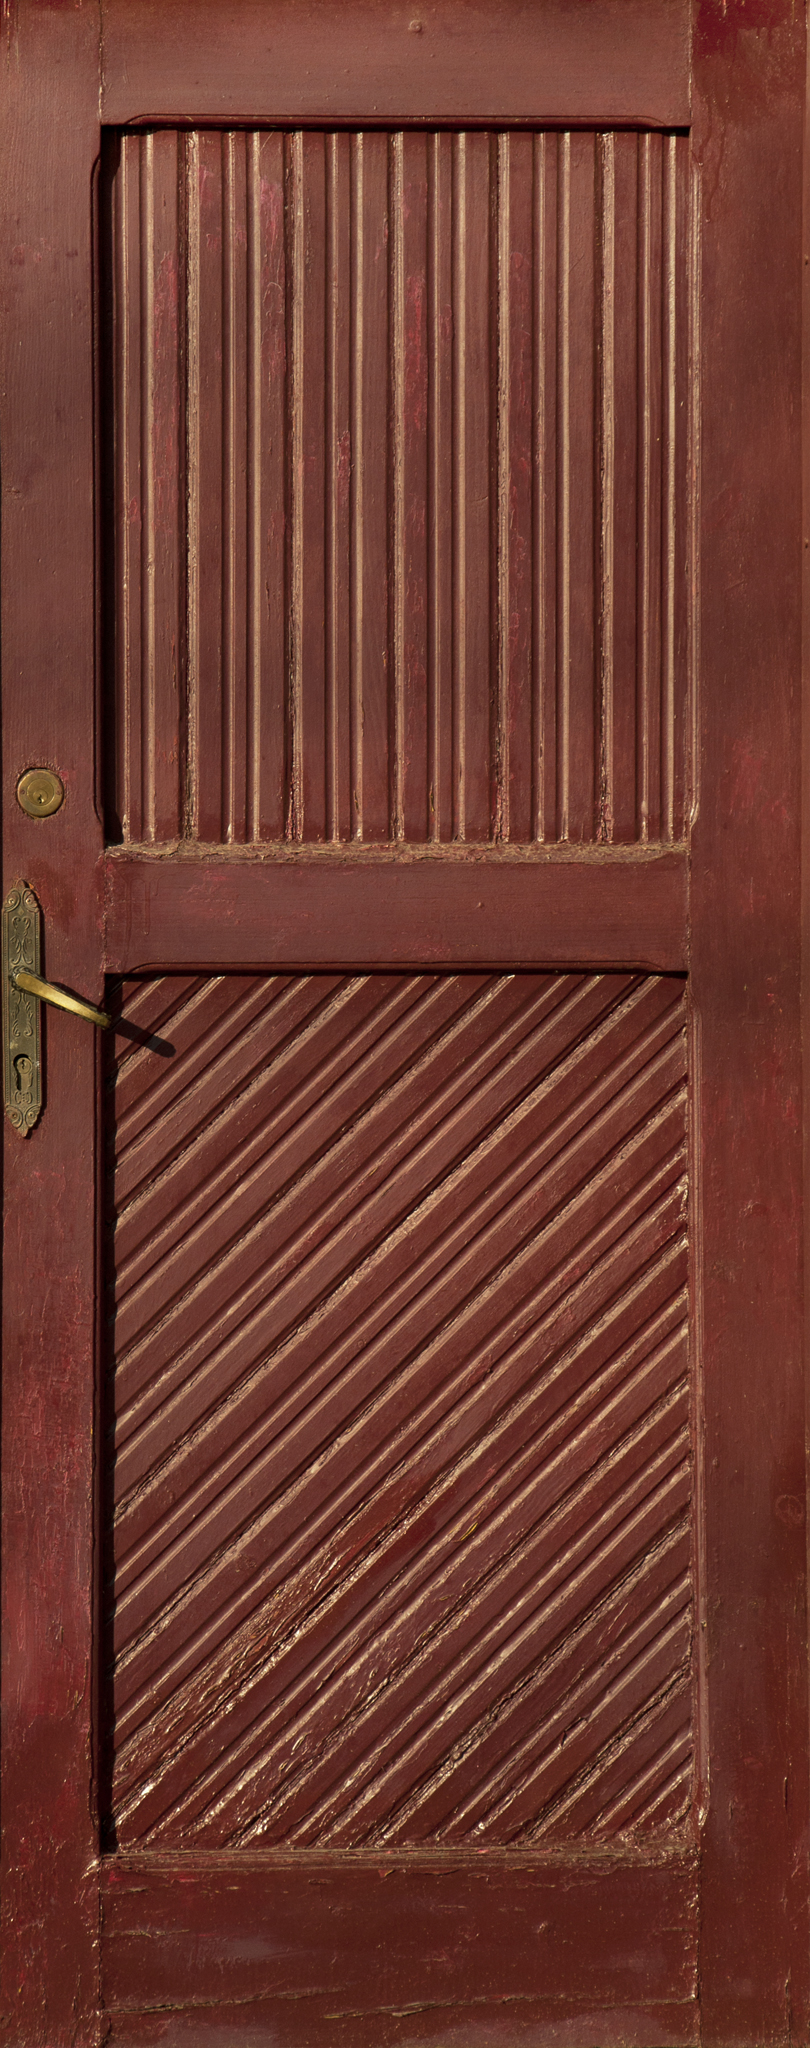 Angled Striped Door.jpg